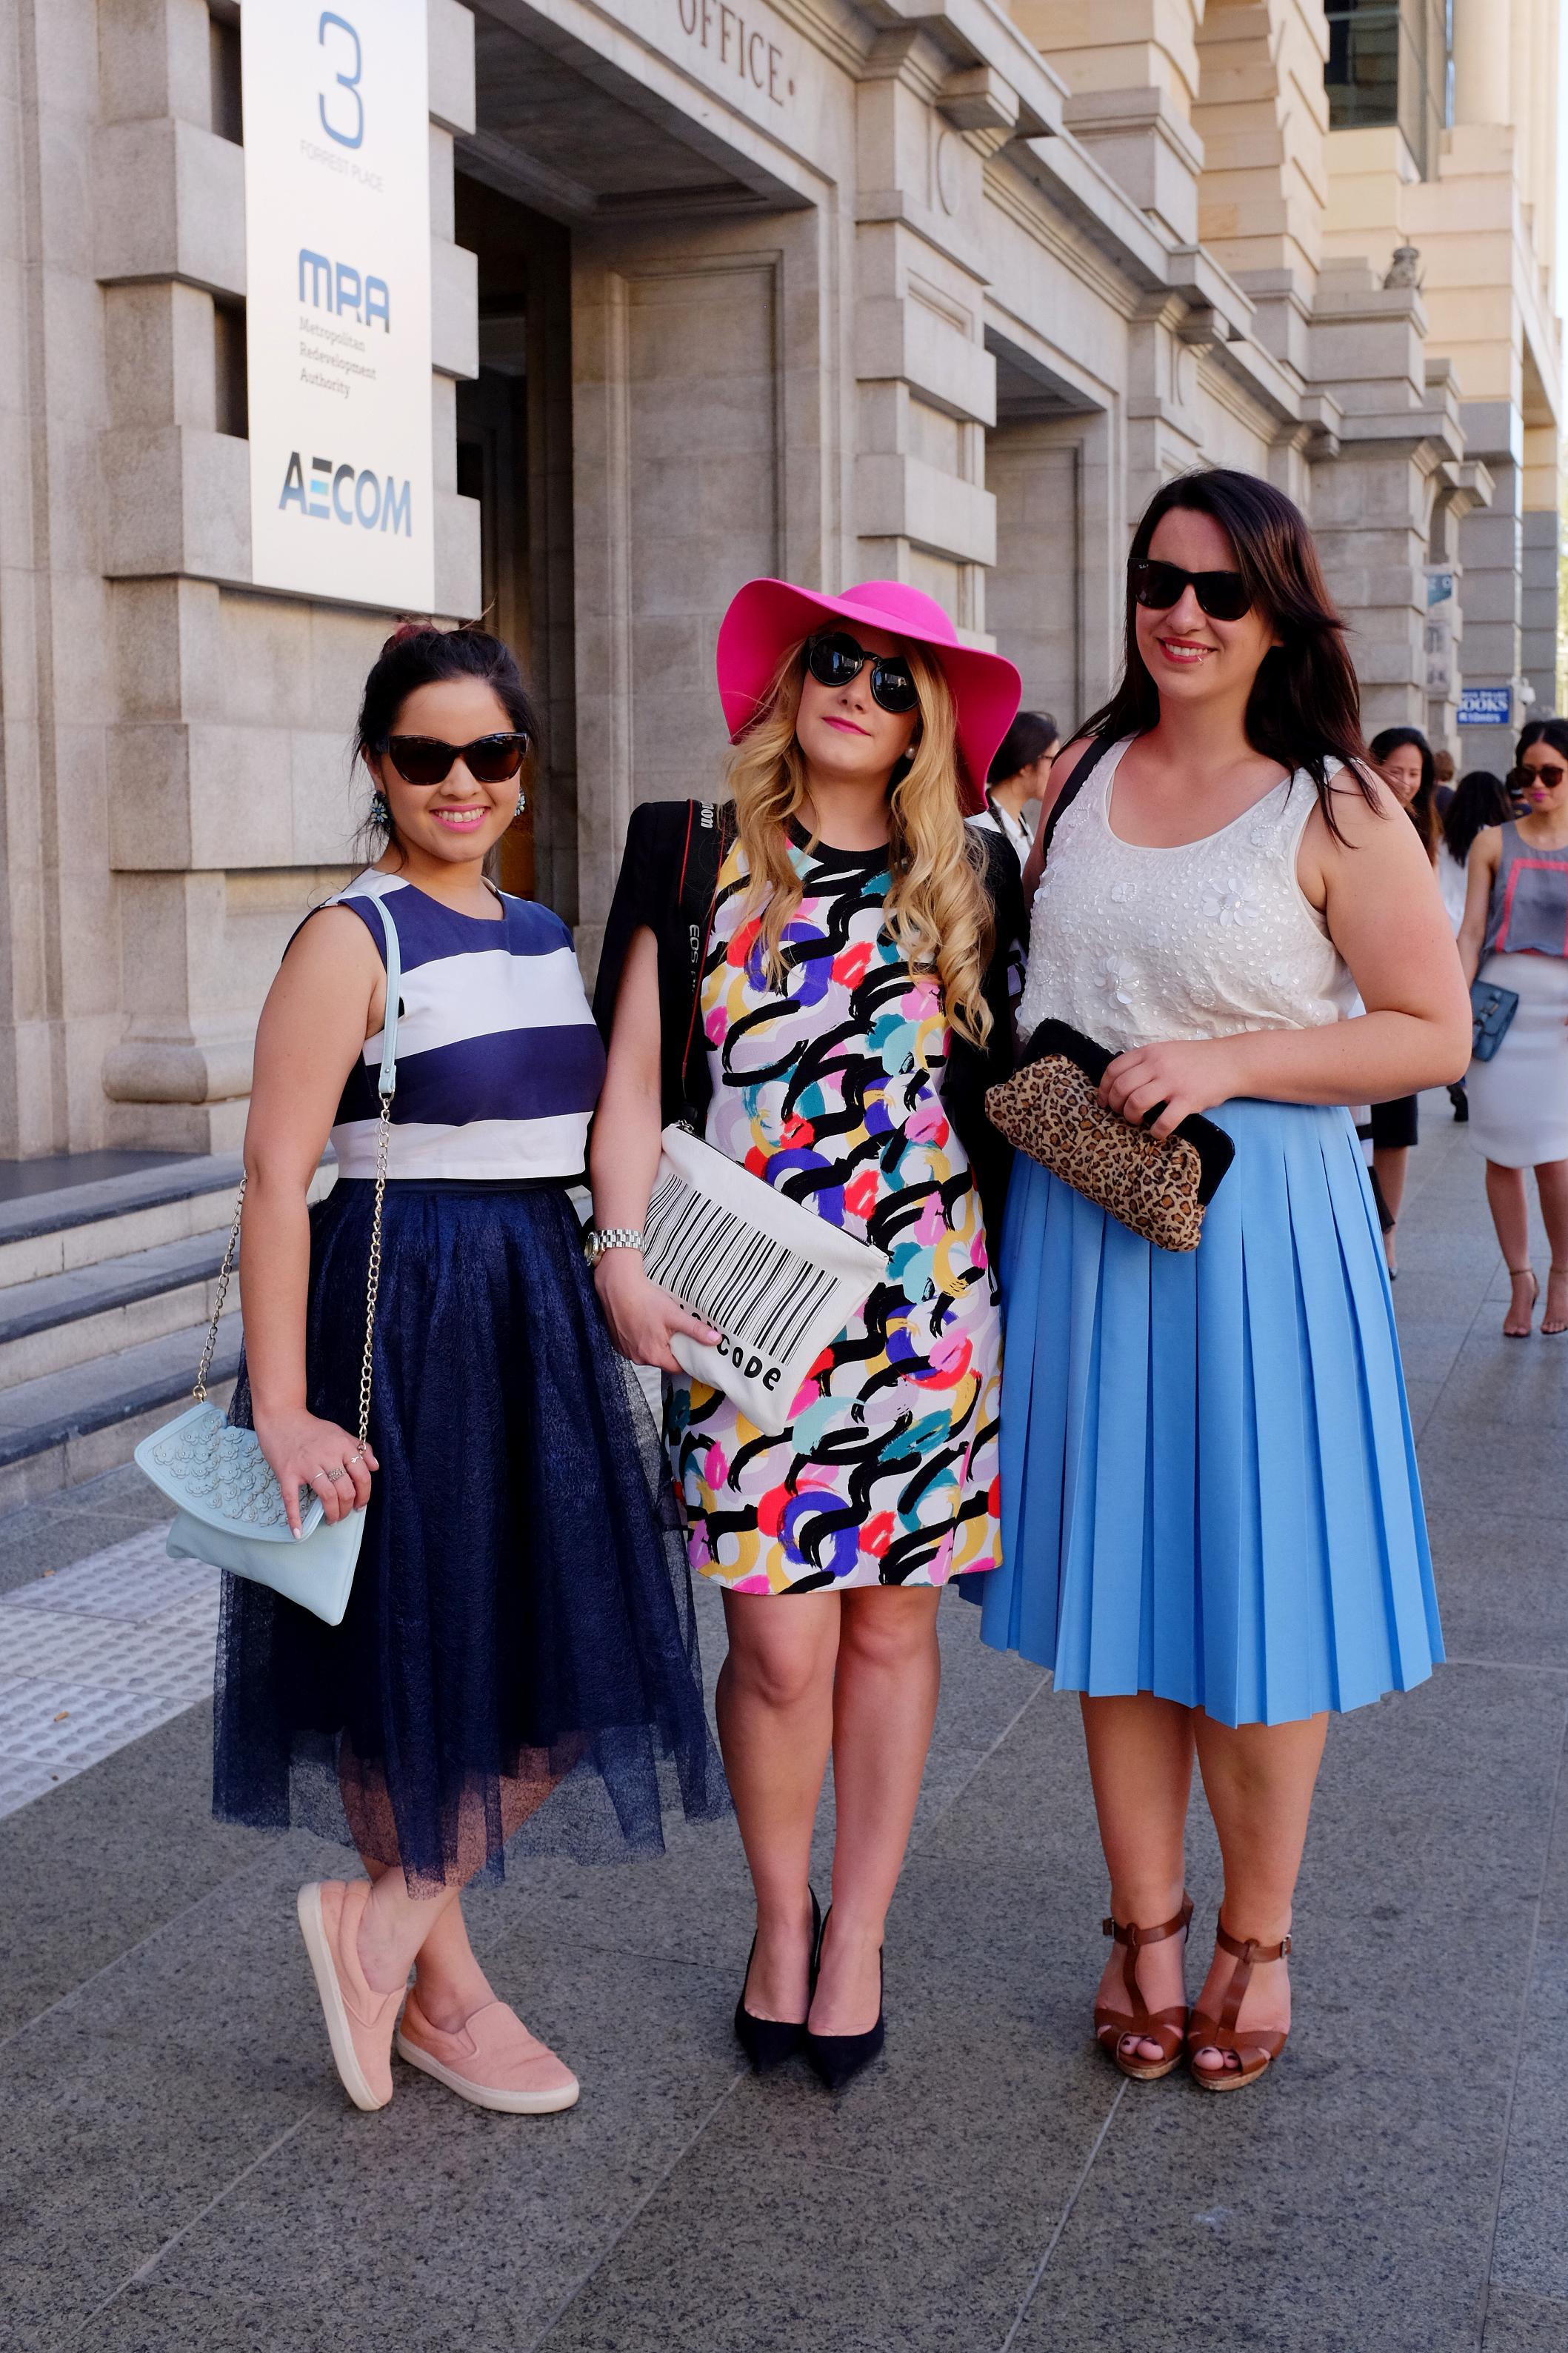 tpff, perth fashion, telstra perth fashion festival, blogger, perth blogger, style, trend, street style, fashion week, Australian designer, fashion photography, get the look, catwalk, runway, perth events, perth life, nezuki